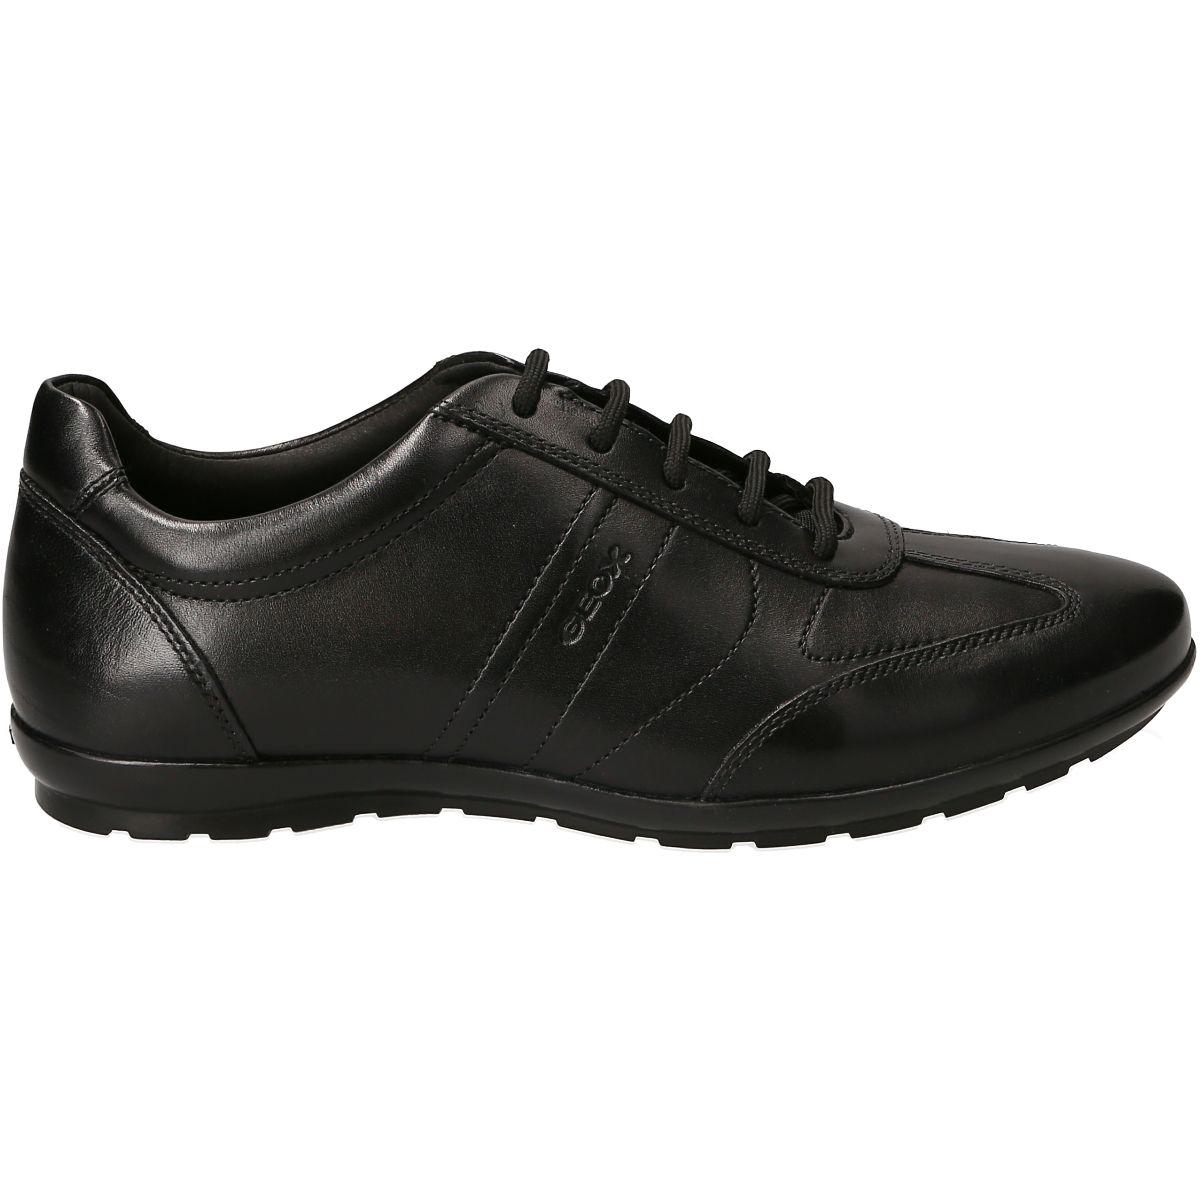 GEOX U74A5B 00043 C9999 Men's shoes Lace ups buy shoes at